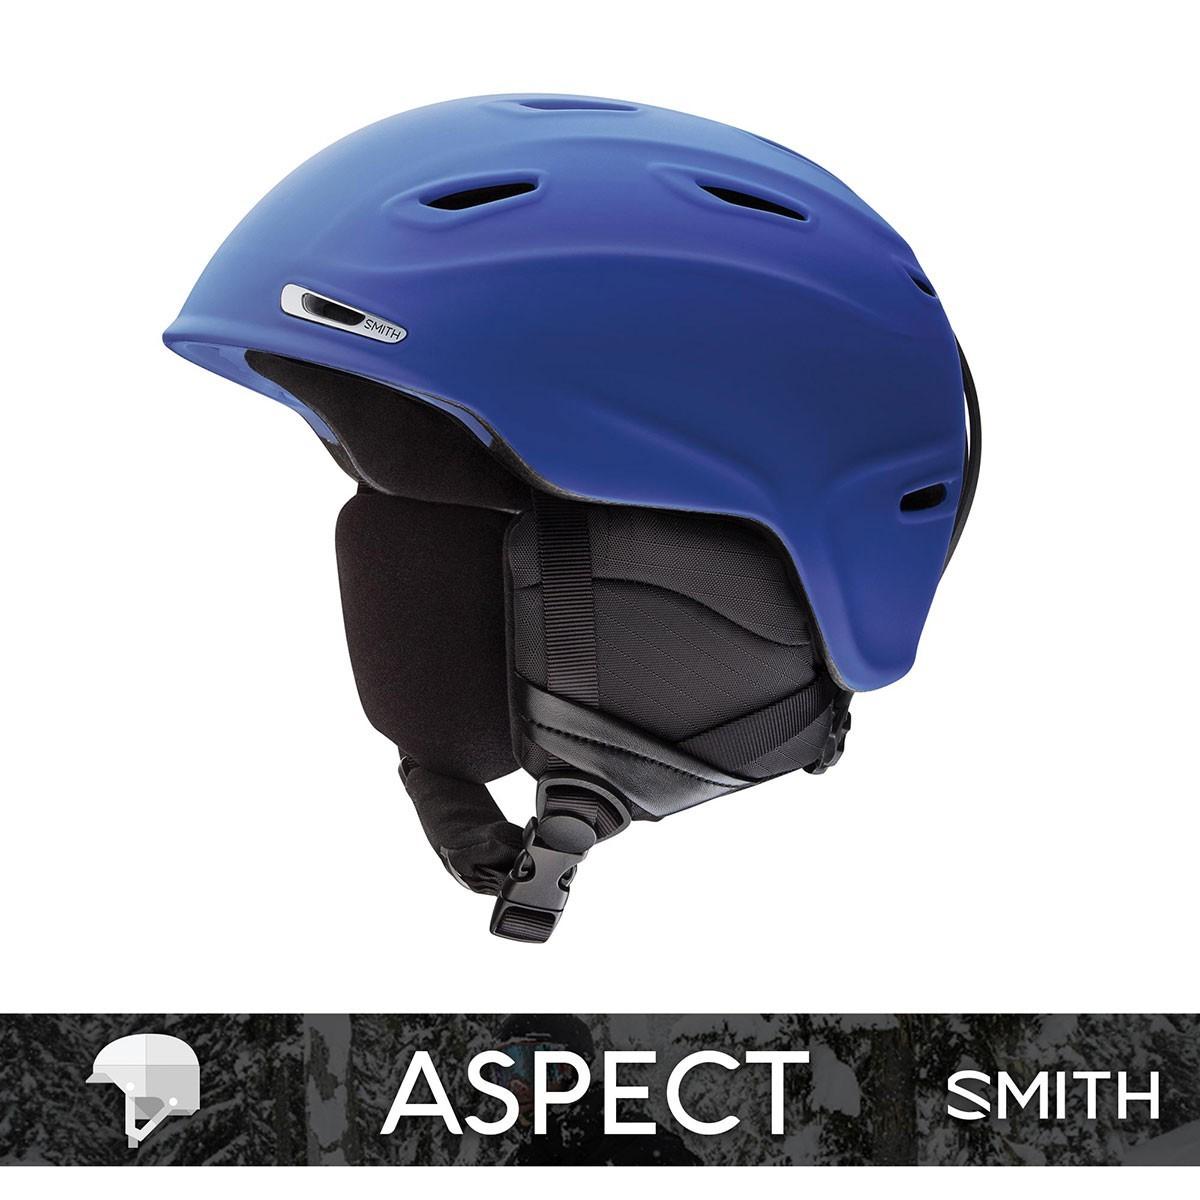 SMITH ASPECT matte Klein Blue - Изображение - AQUAMATRIX